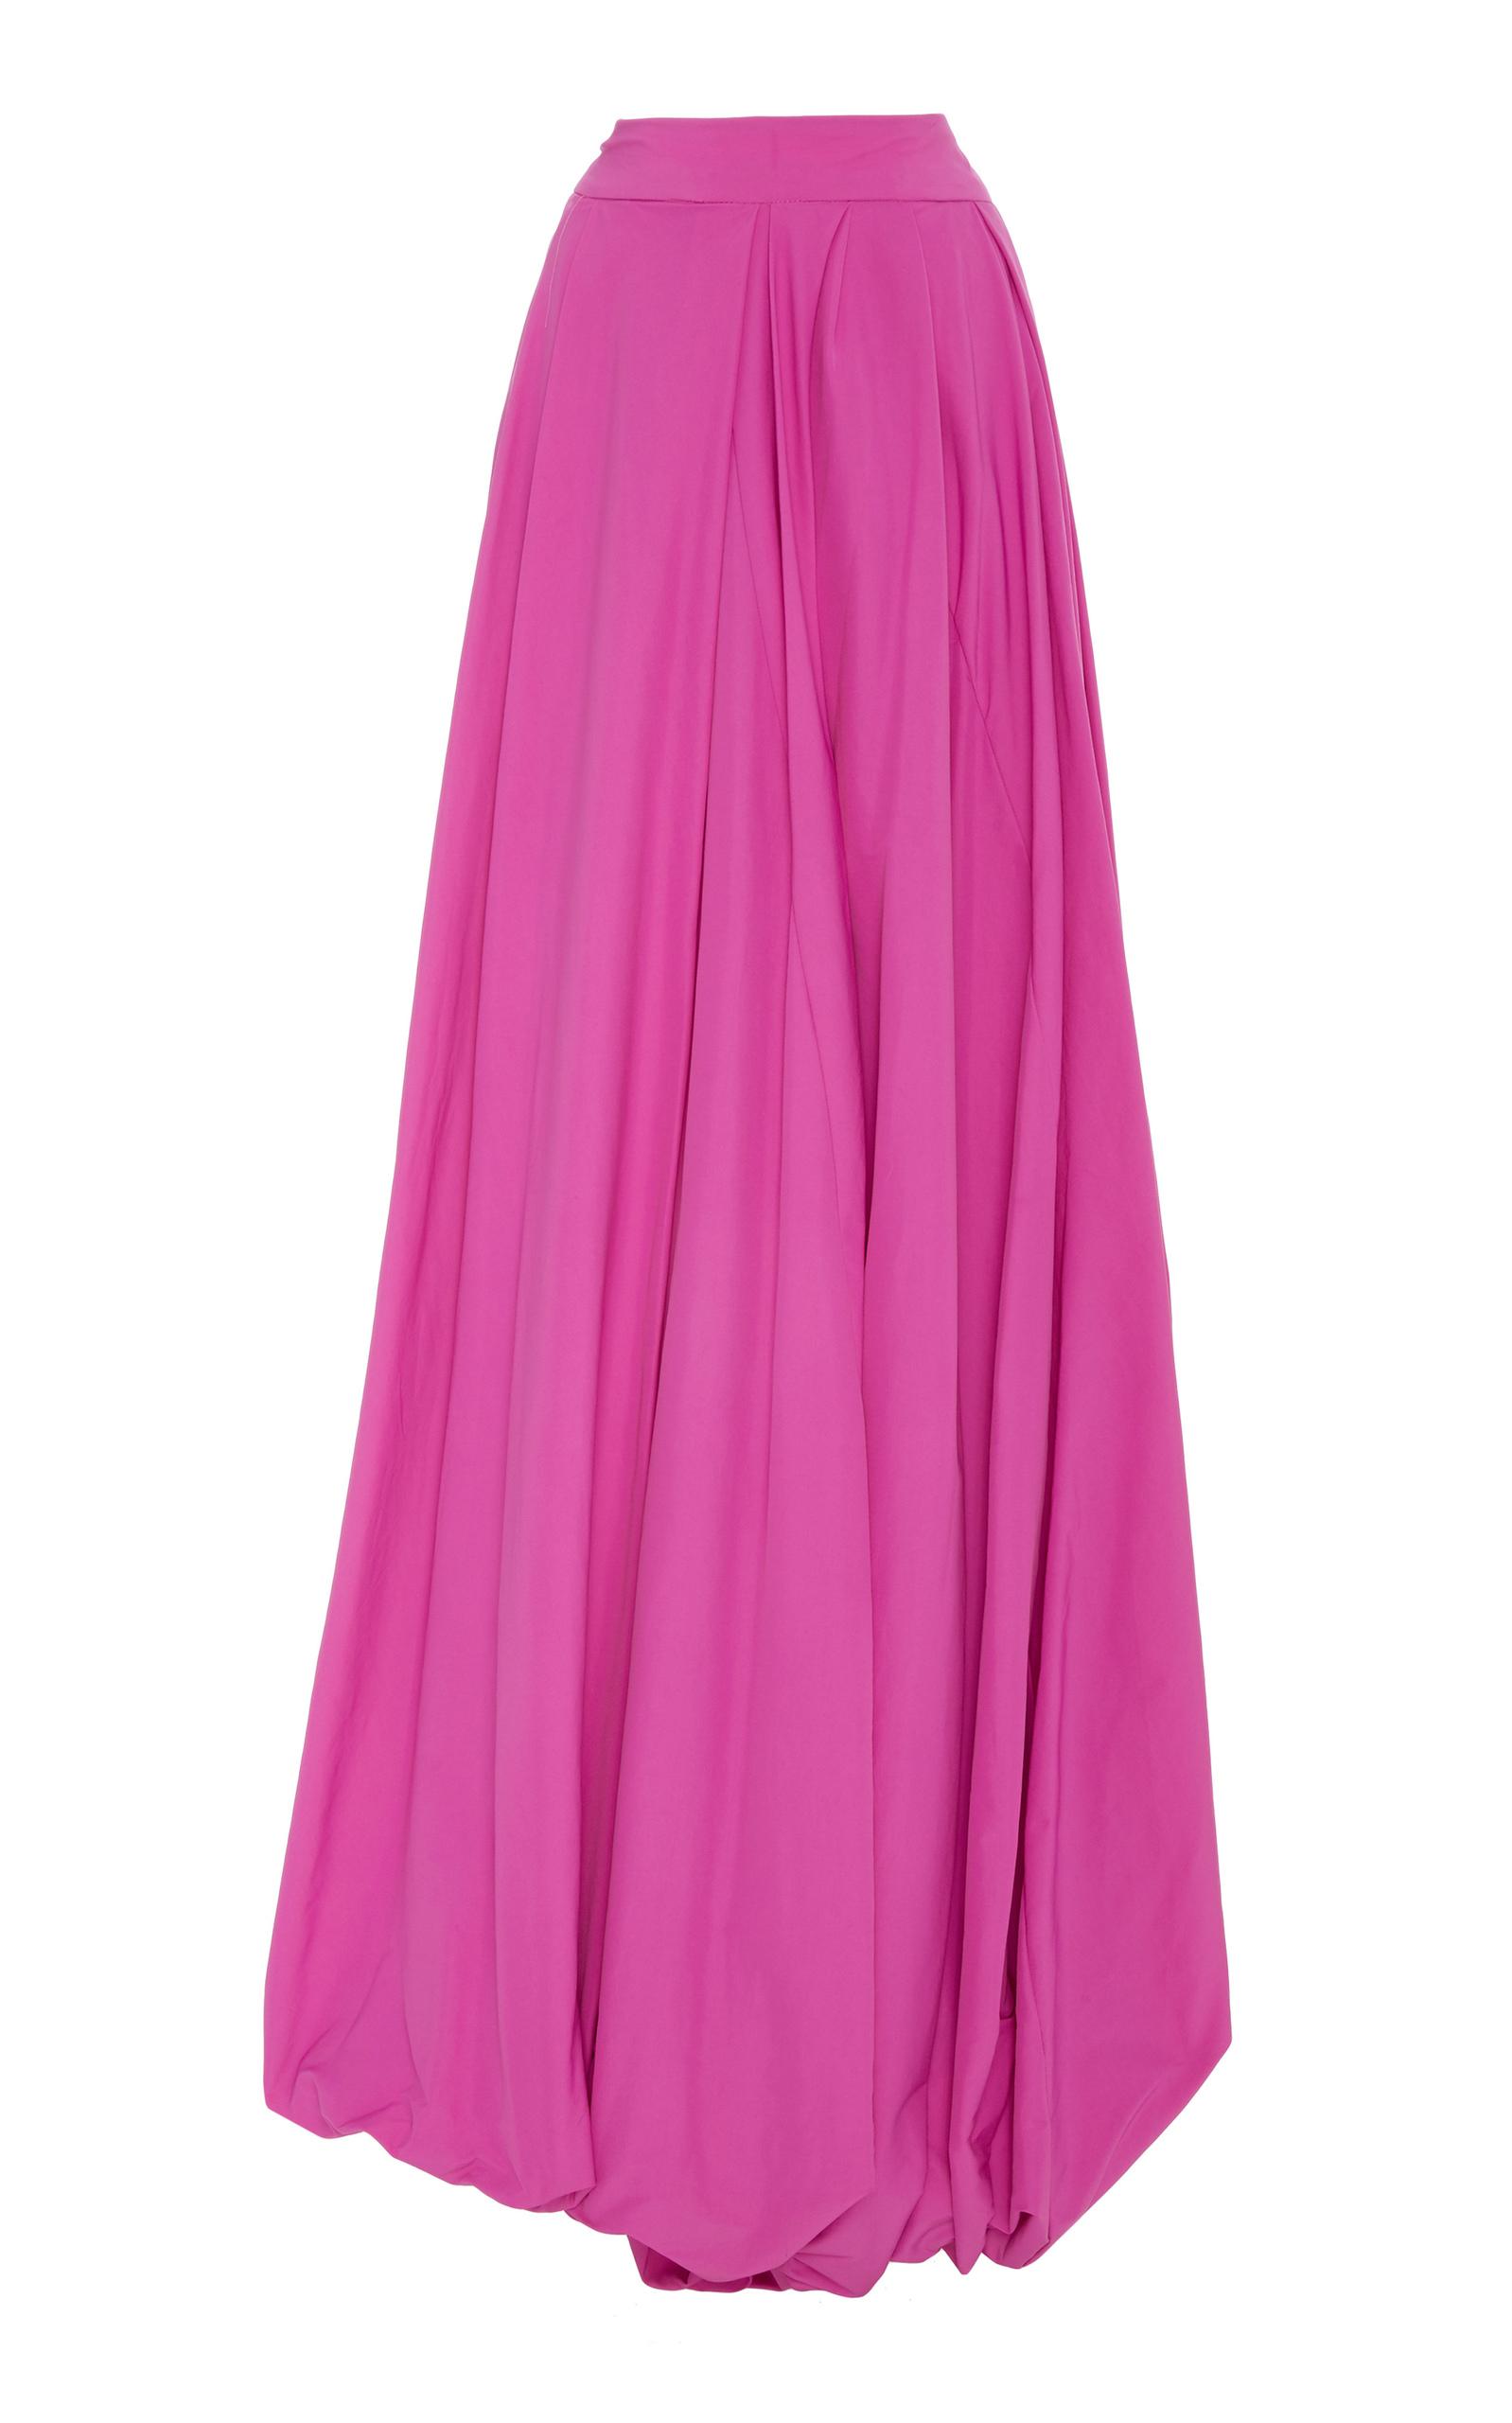 Pleated Poplin High-Waist Maxi Skirt in Pink